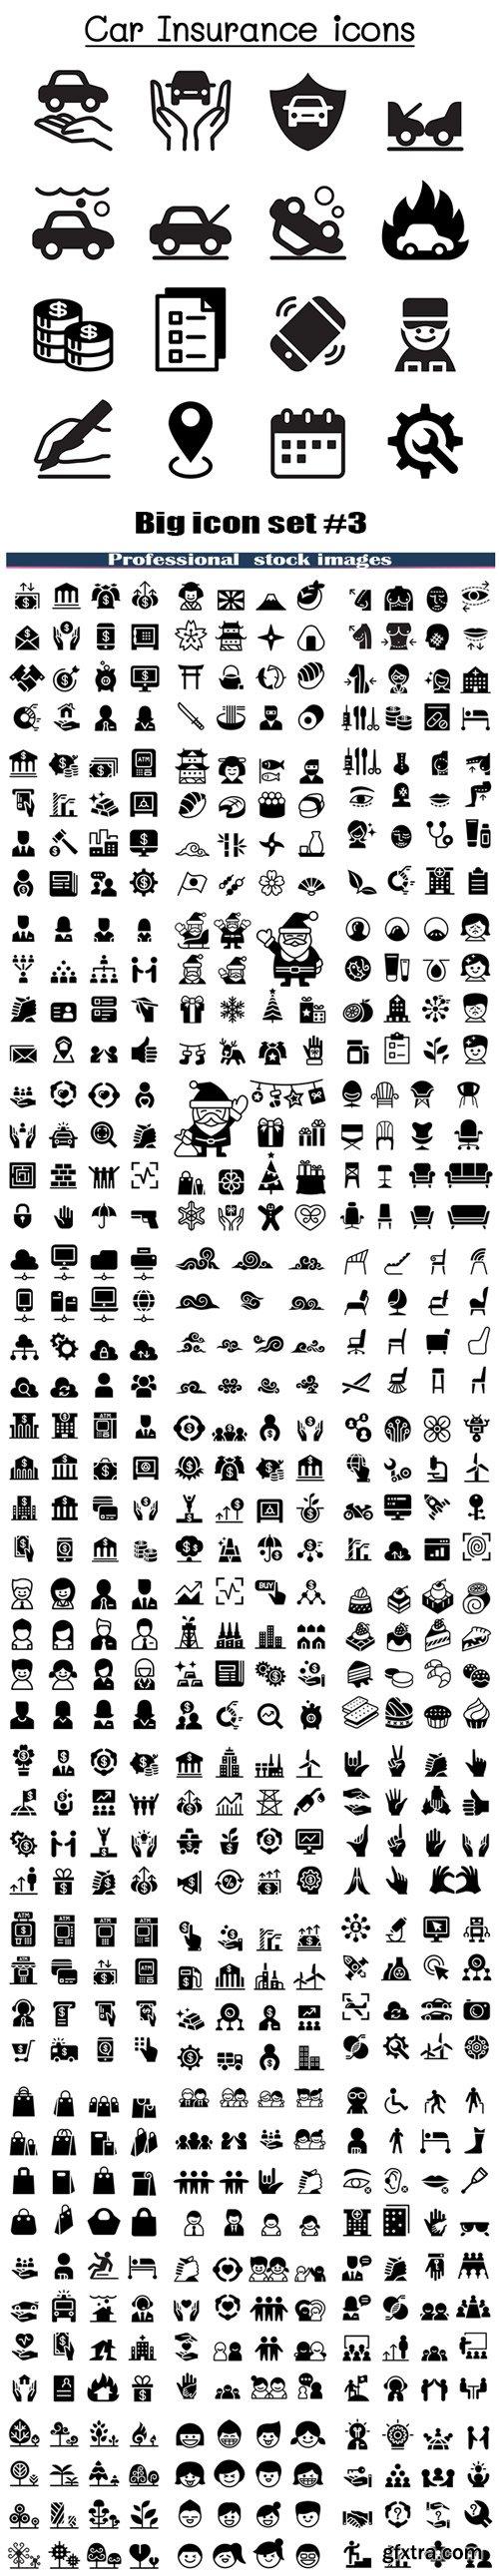 Big icon set #3